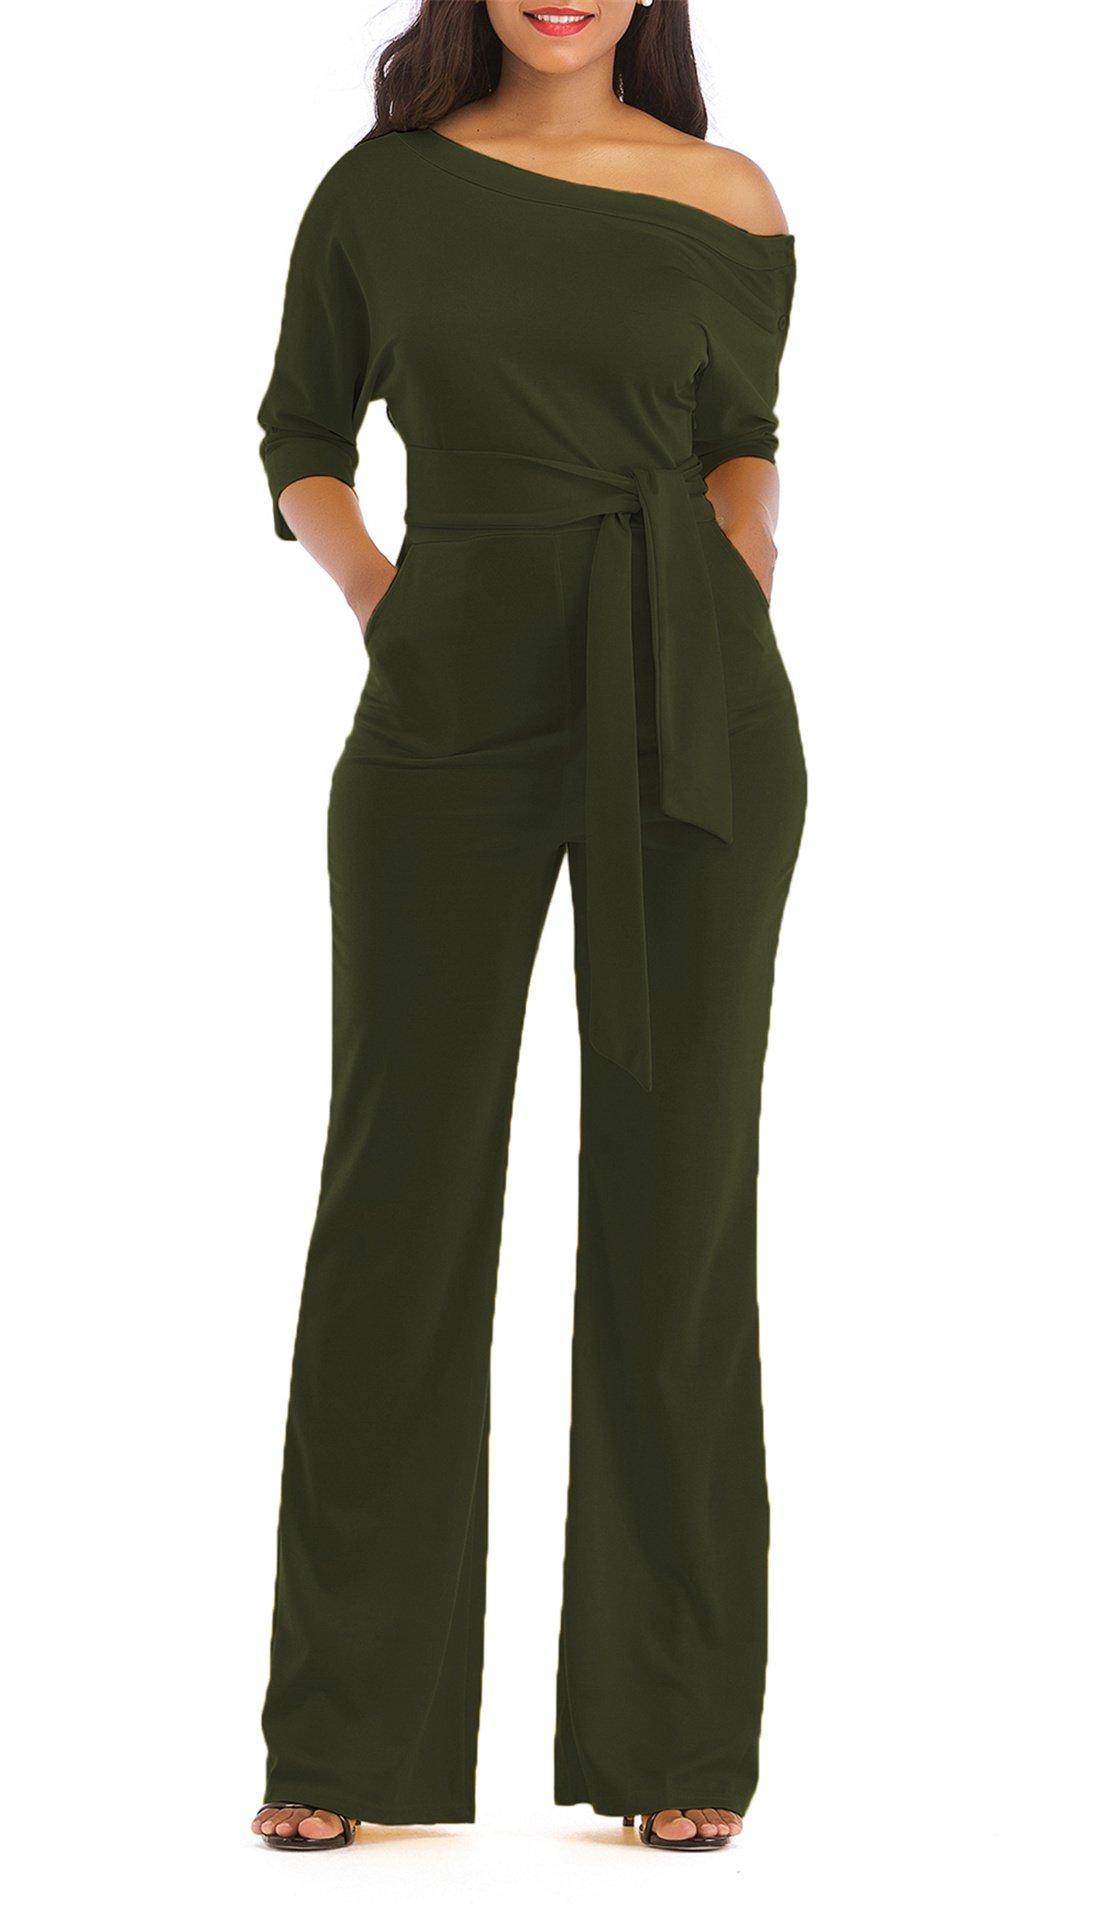 ONLYSHE Women's Elegant One Shoulder Wide Leg Boot Cut Jumpsuit with Belt Dark Green Medium